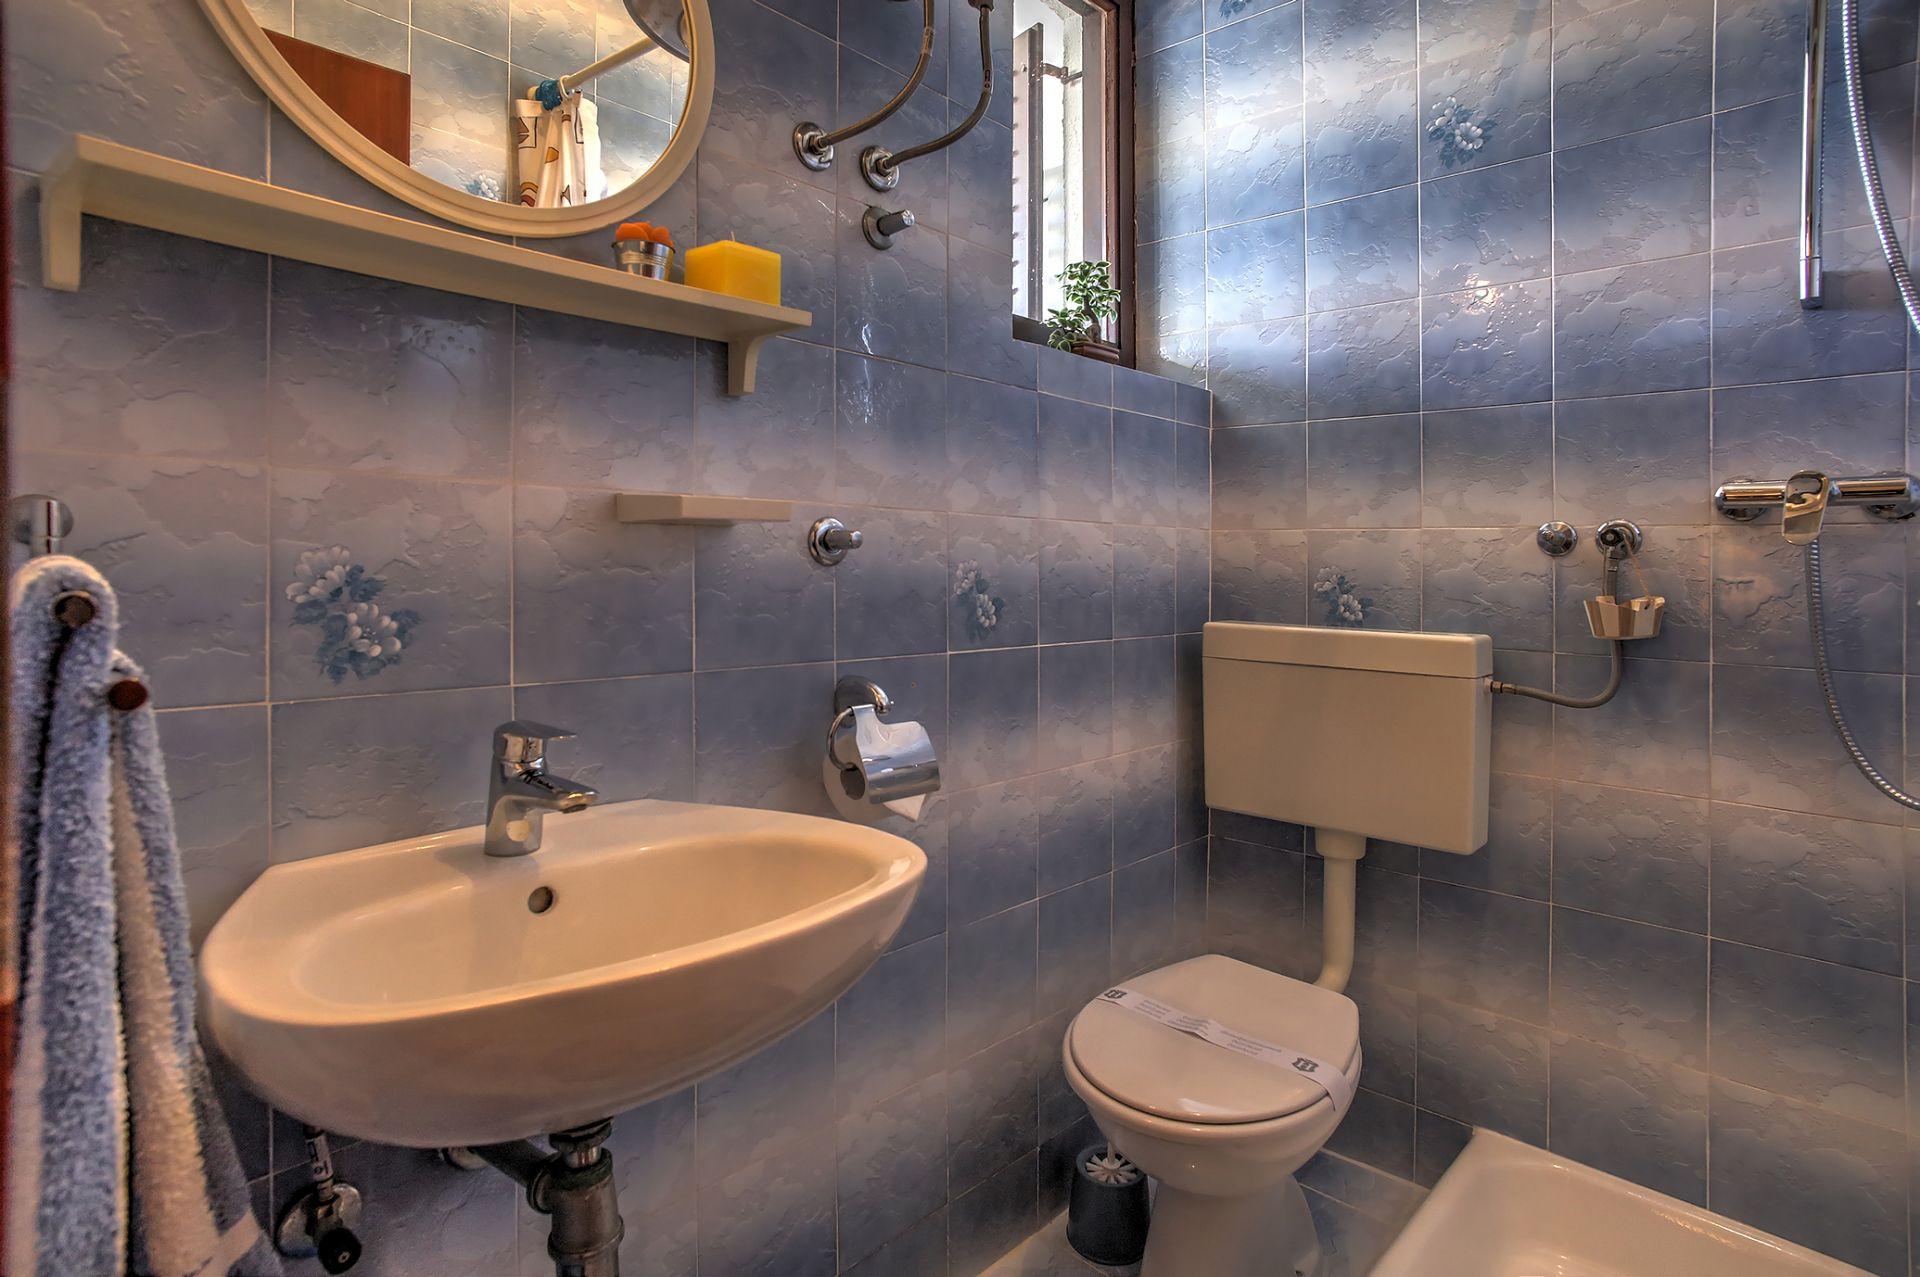 5409 - Jezera - Apartments Croatia - SA4(2): bathroom with toilet